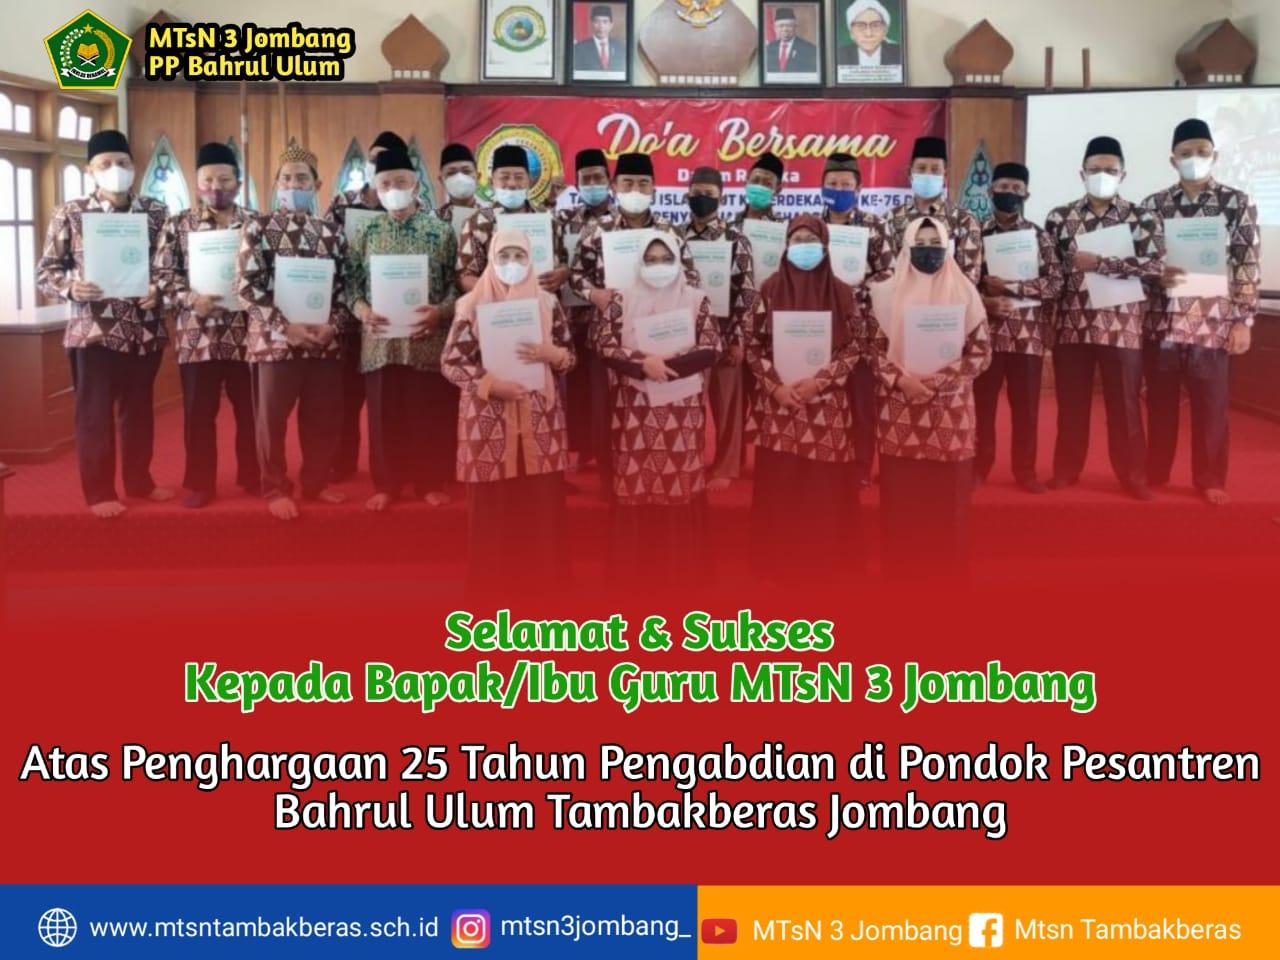 Penghargaan Guru Masa Abdi 25 Tahun PP Bahrul Ulum Tambakberas Jombang